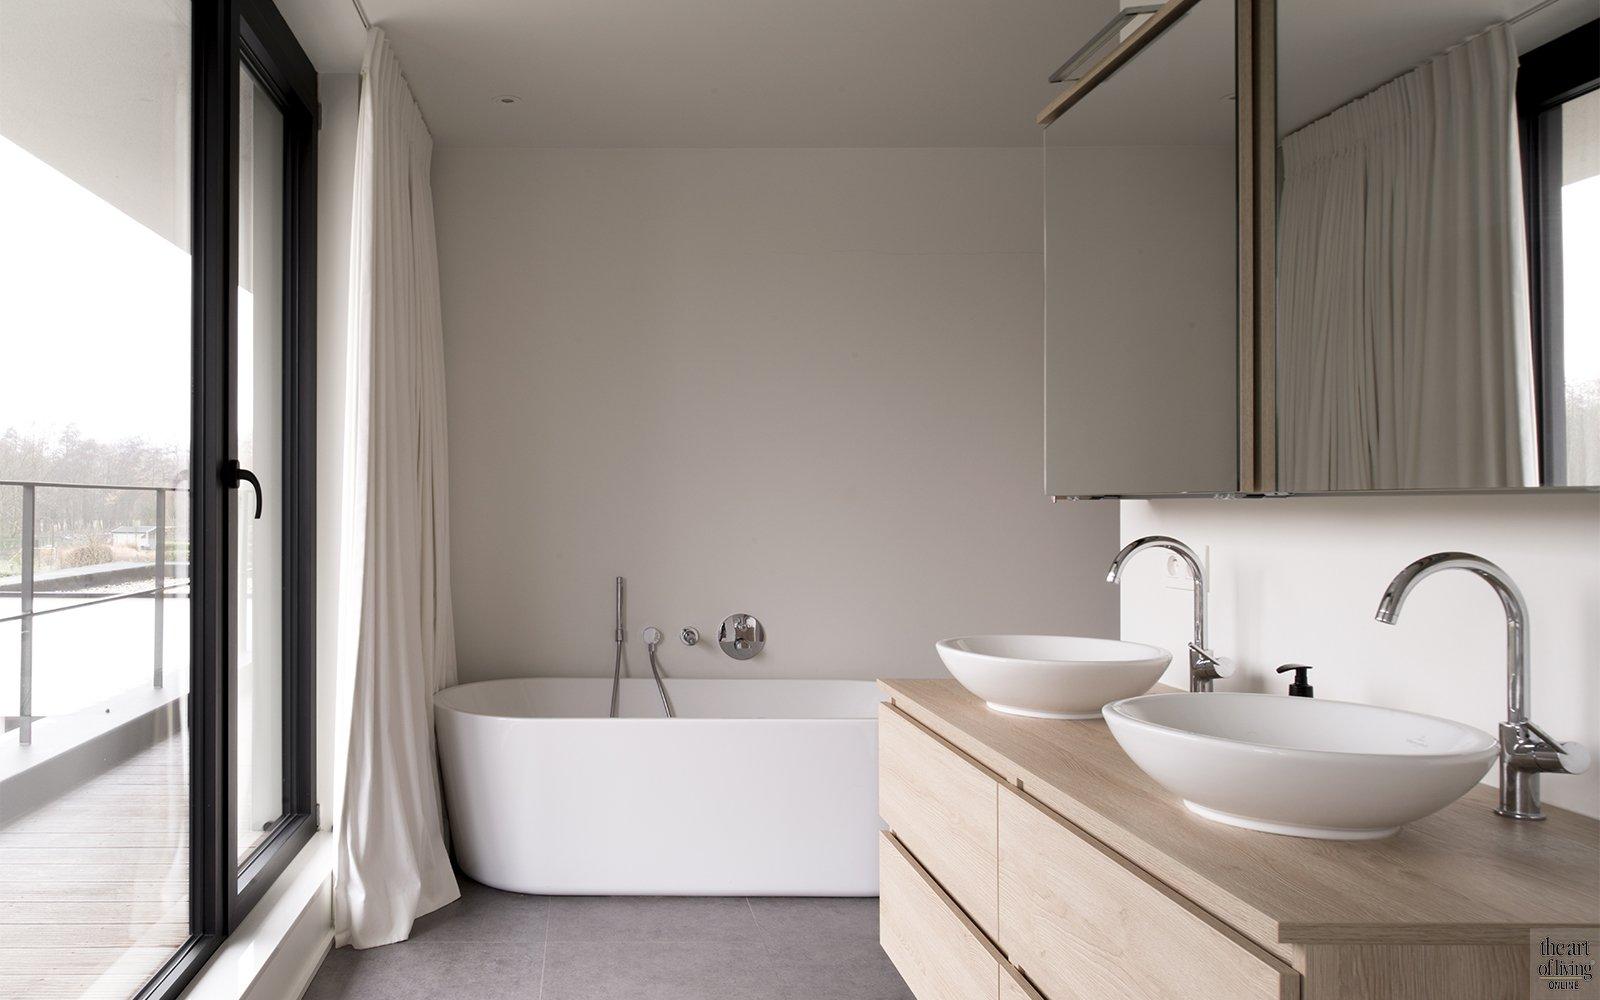 Tijdloos wonen, Kris van den Broeck, Modern interieur, Wit interieur, Strak Interieur, Badkamer, Vrijstaand bad, Moderne badkamer